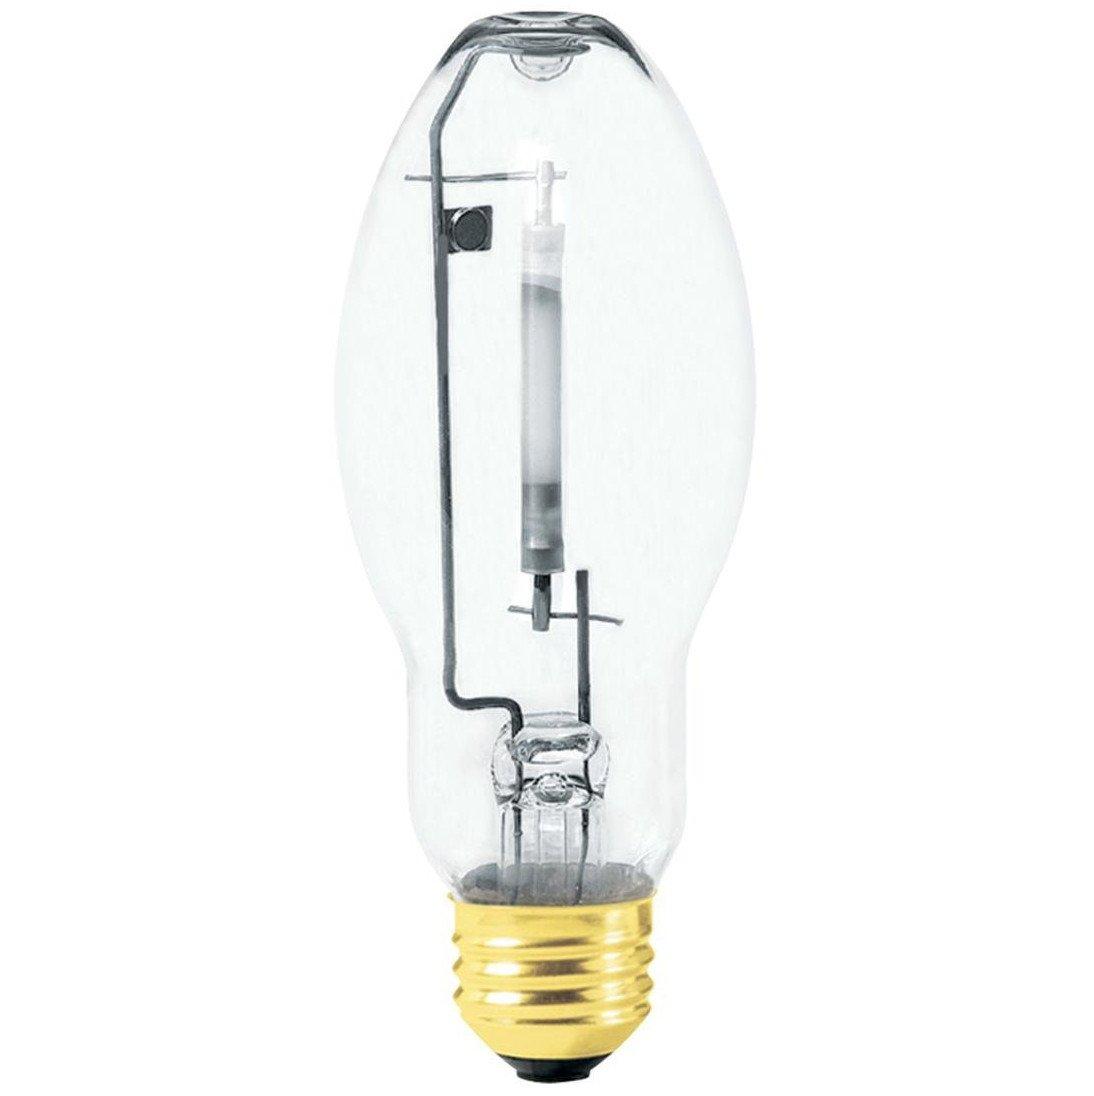 Philips 30347-9 (6-Pack) C150S55/M 150-Watt High Pressure Sodium HID Light Bulb, 2100K, 16500 Lumens, E26 Base